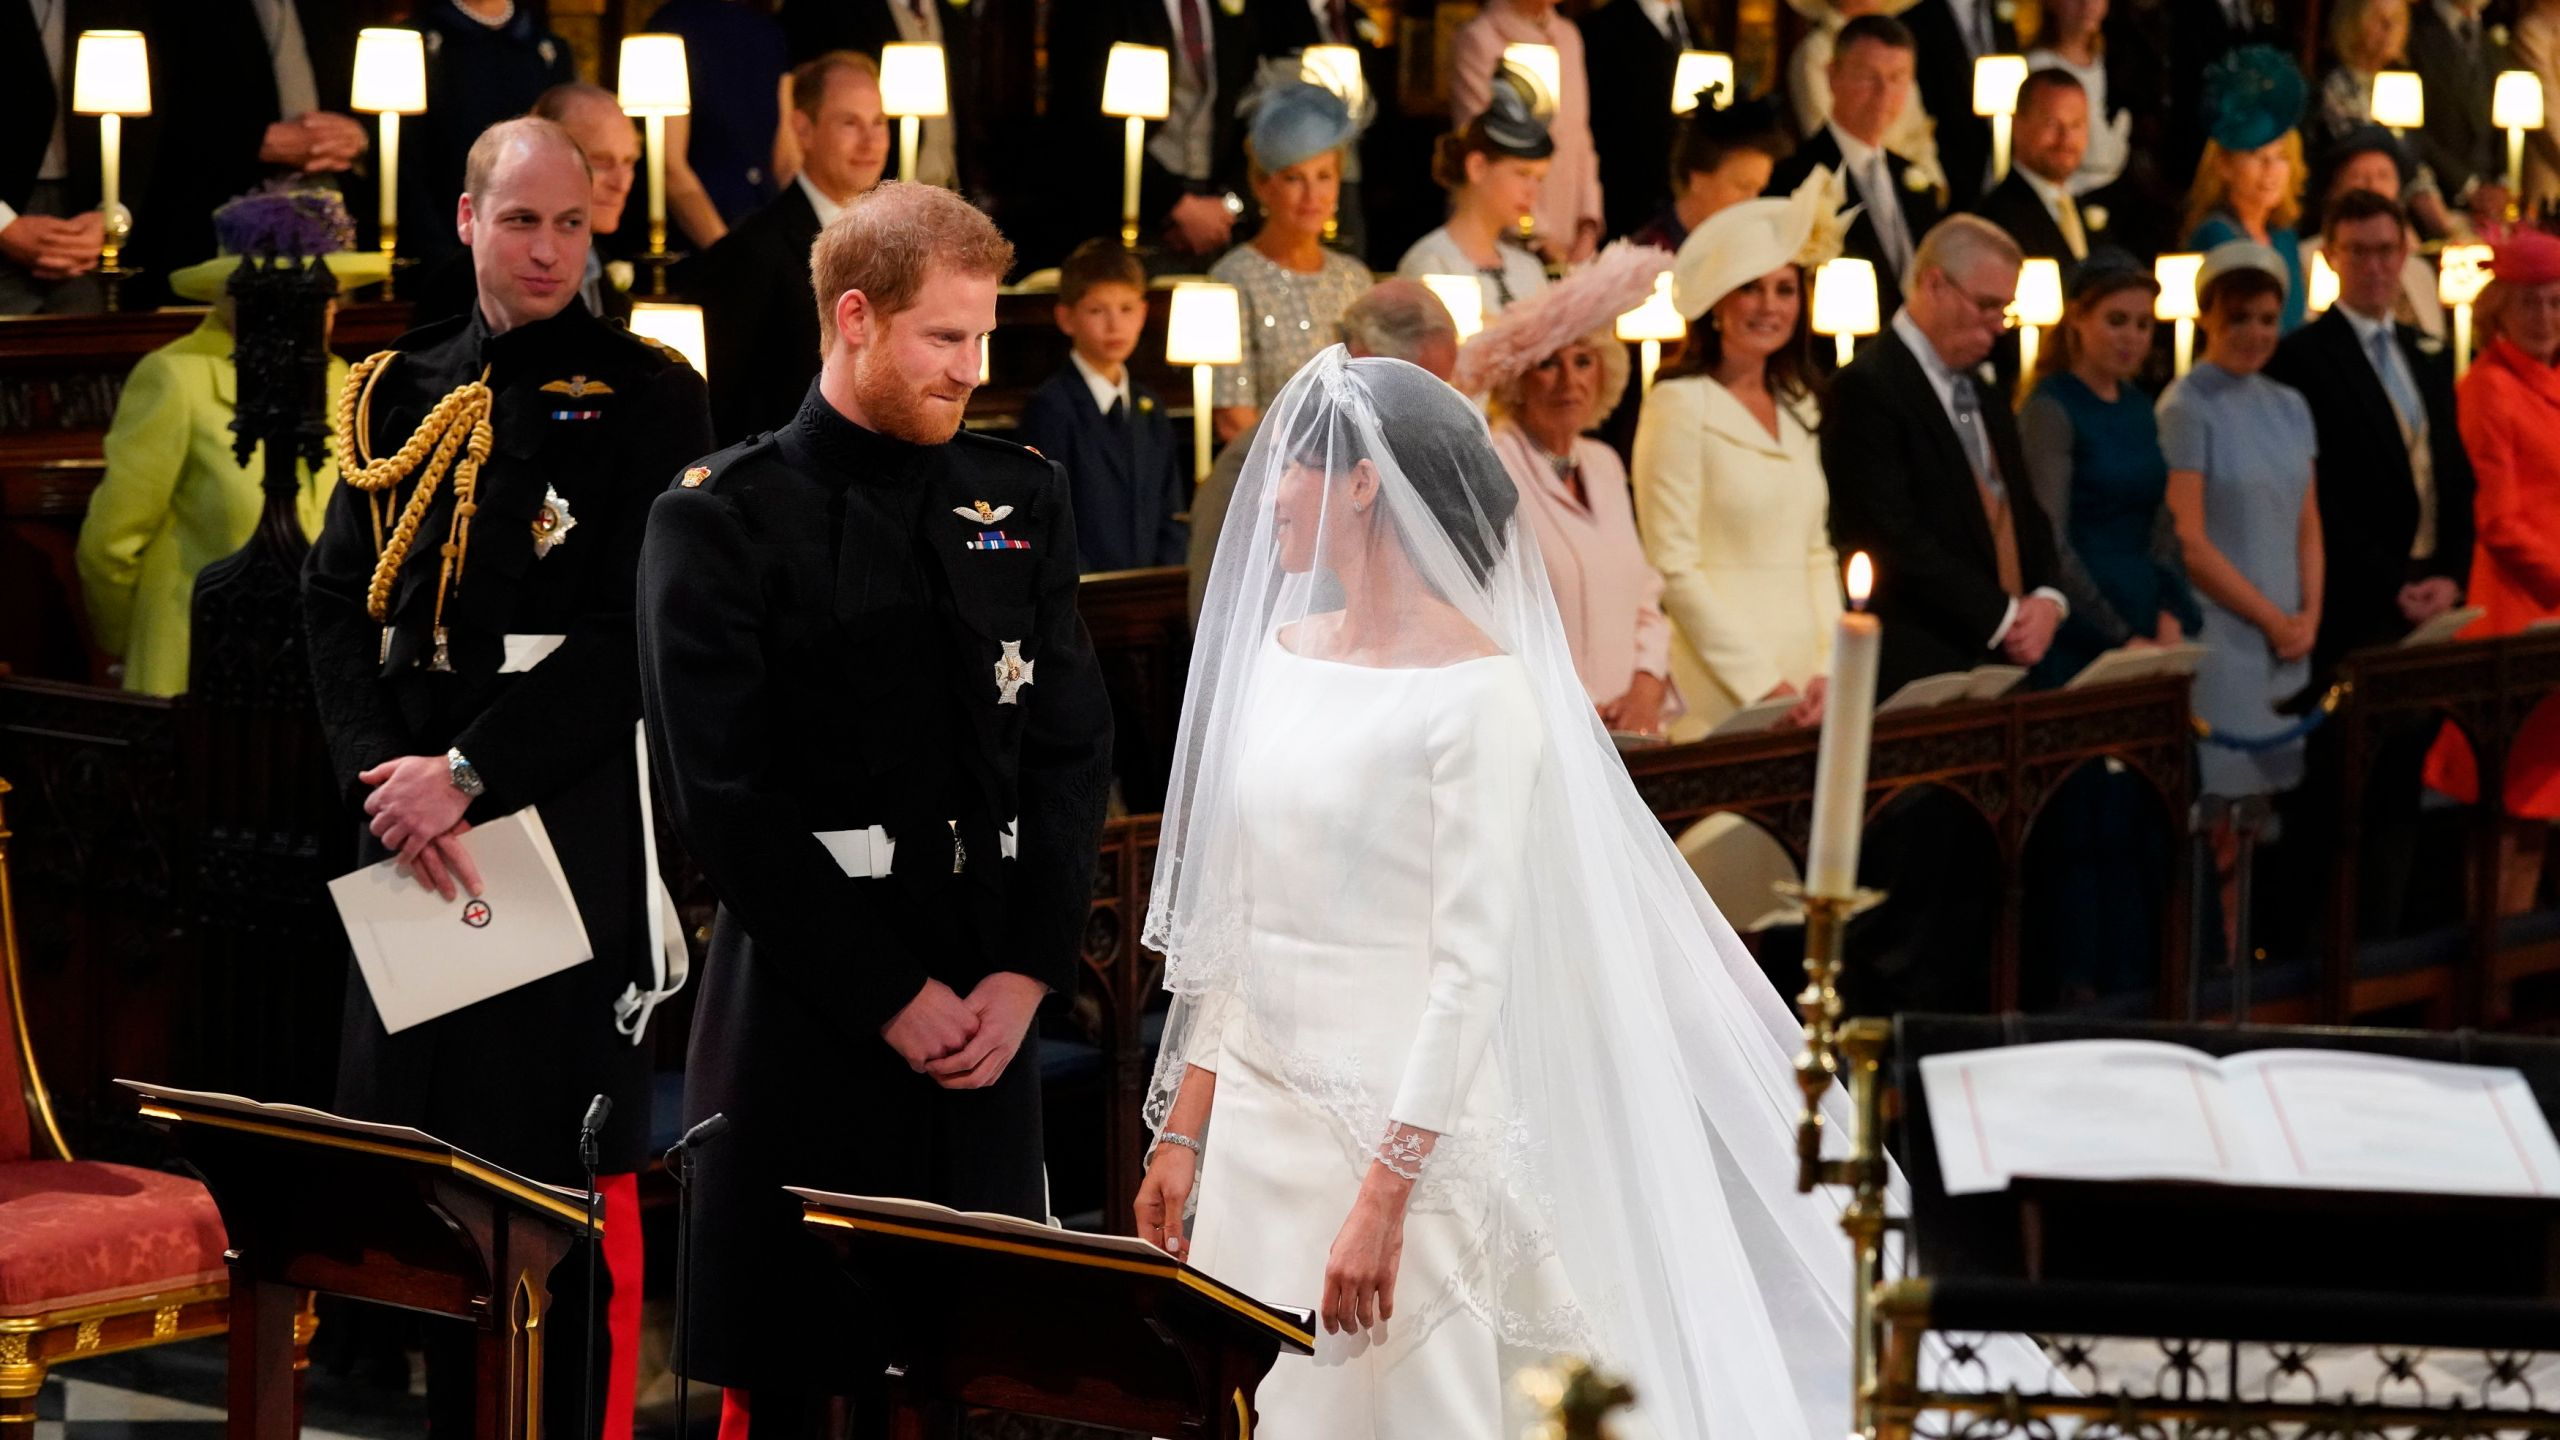 Britain_Royal_Wedding_69267-159532.jpg74469404